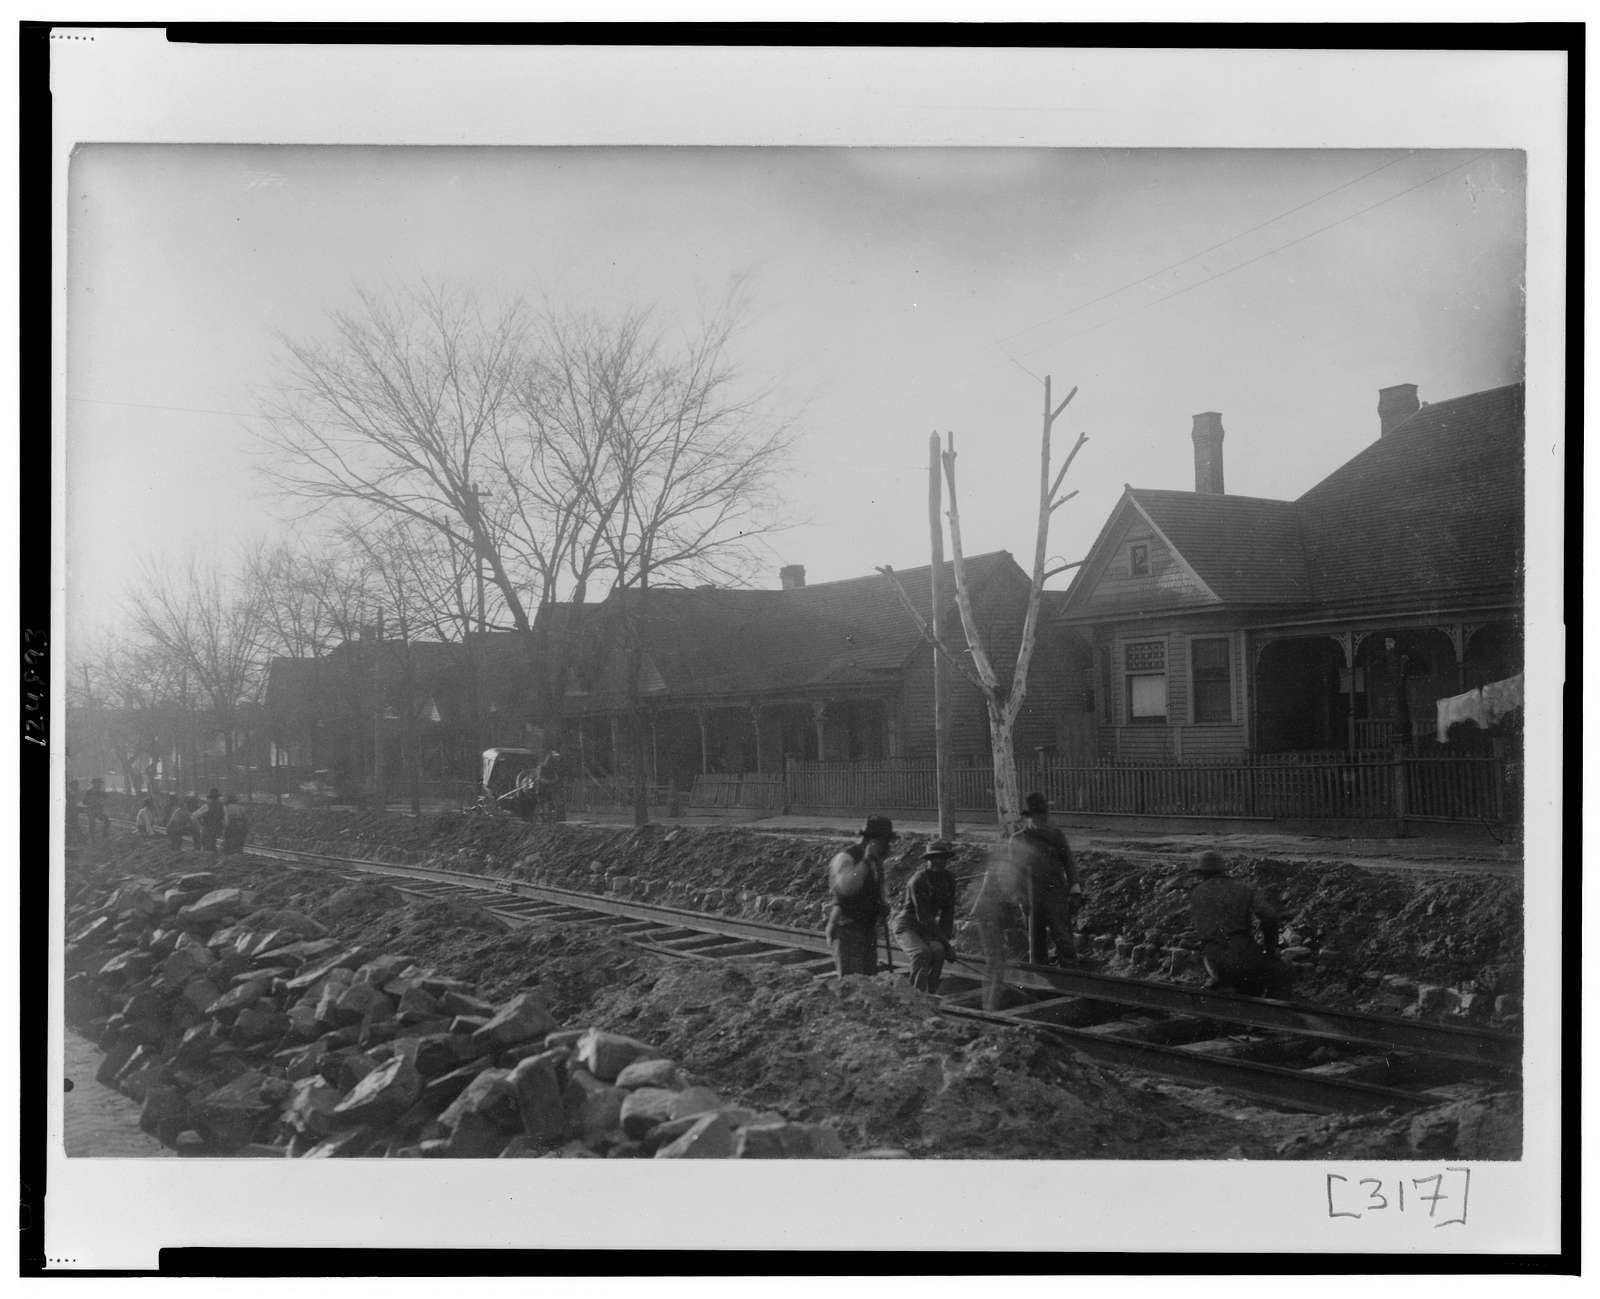 [Railroad construction through residential area in Georgia]